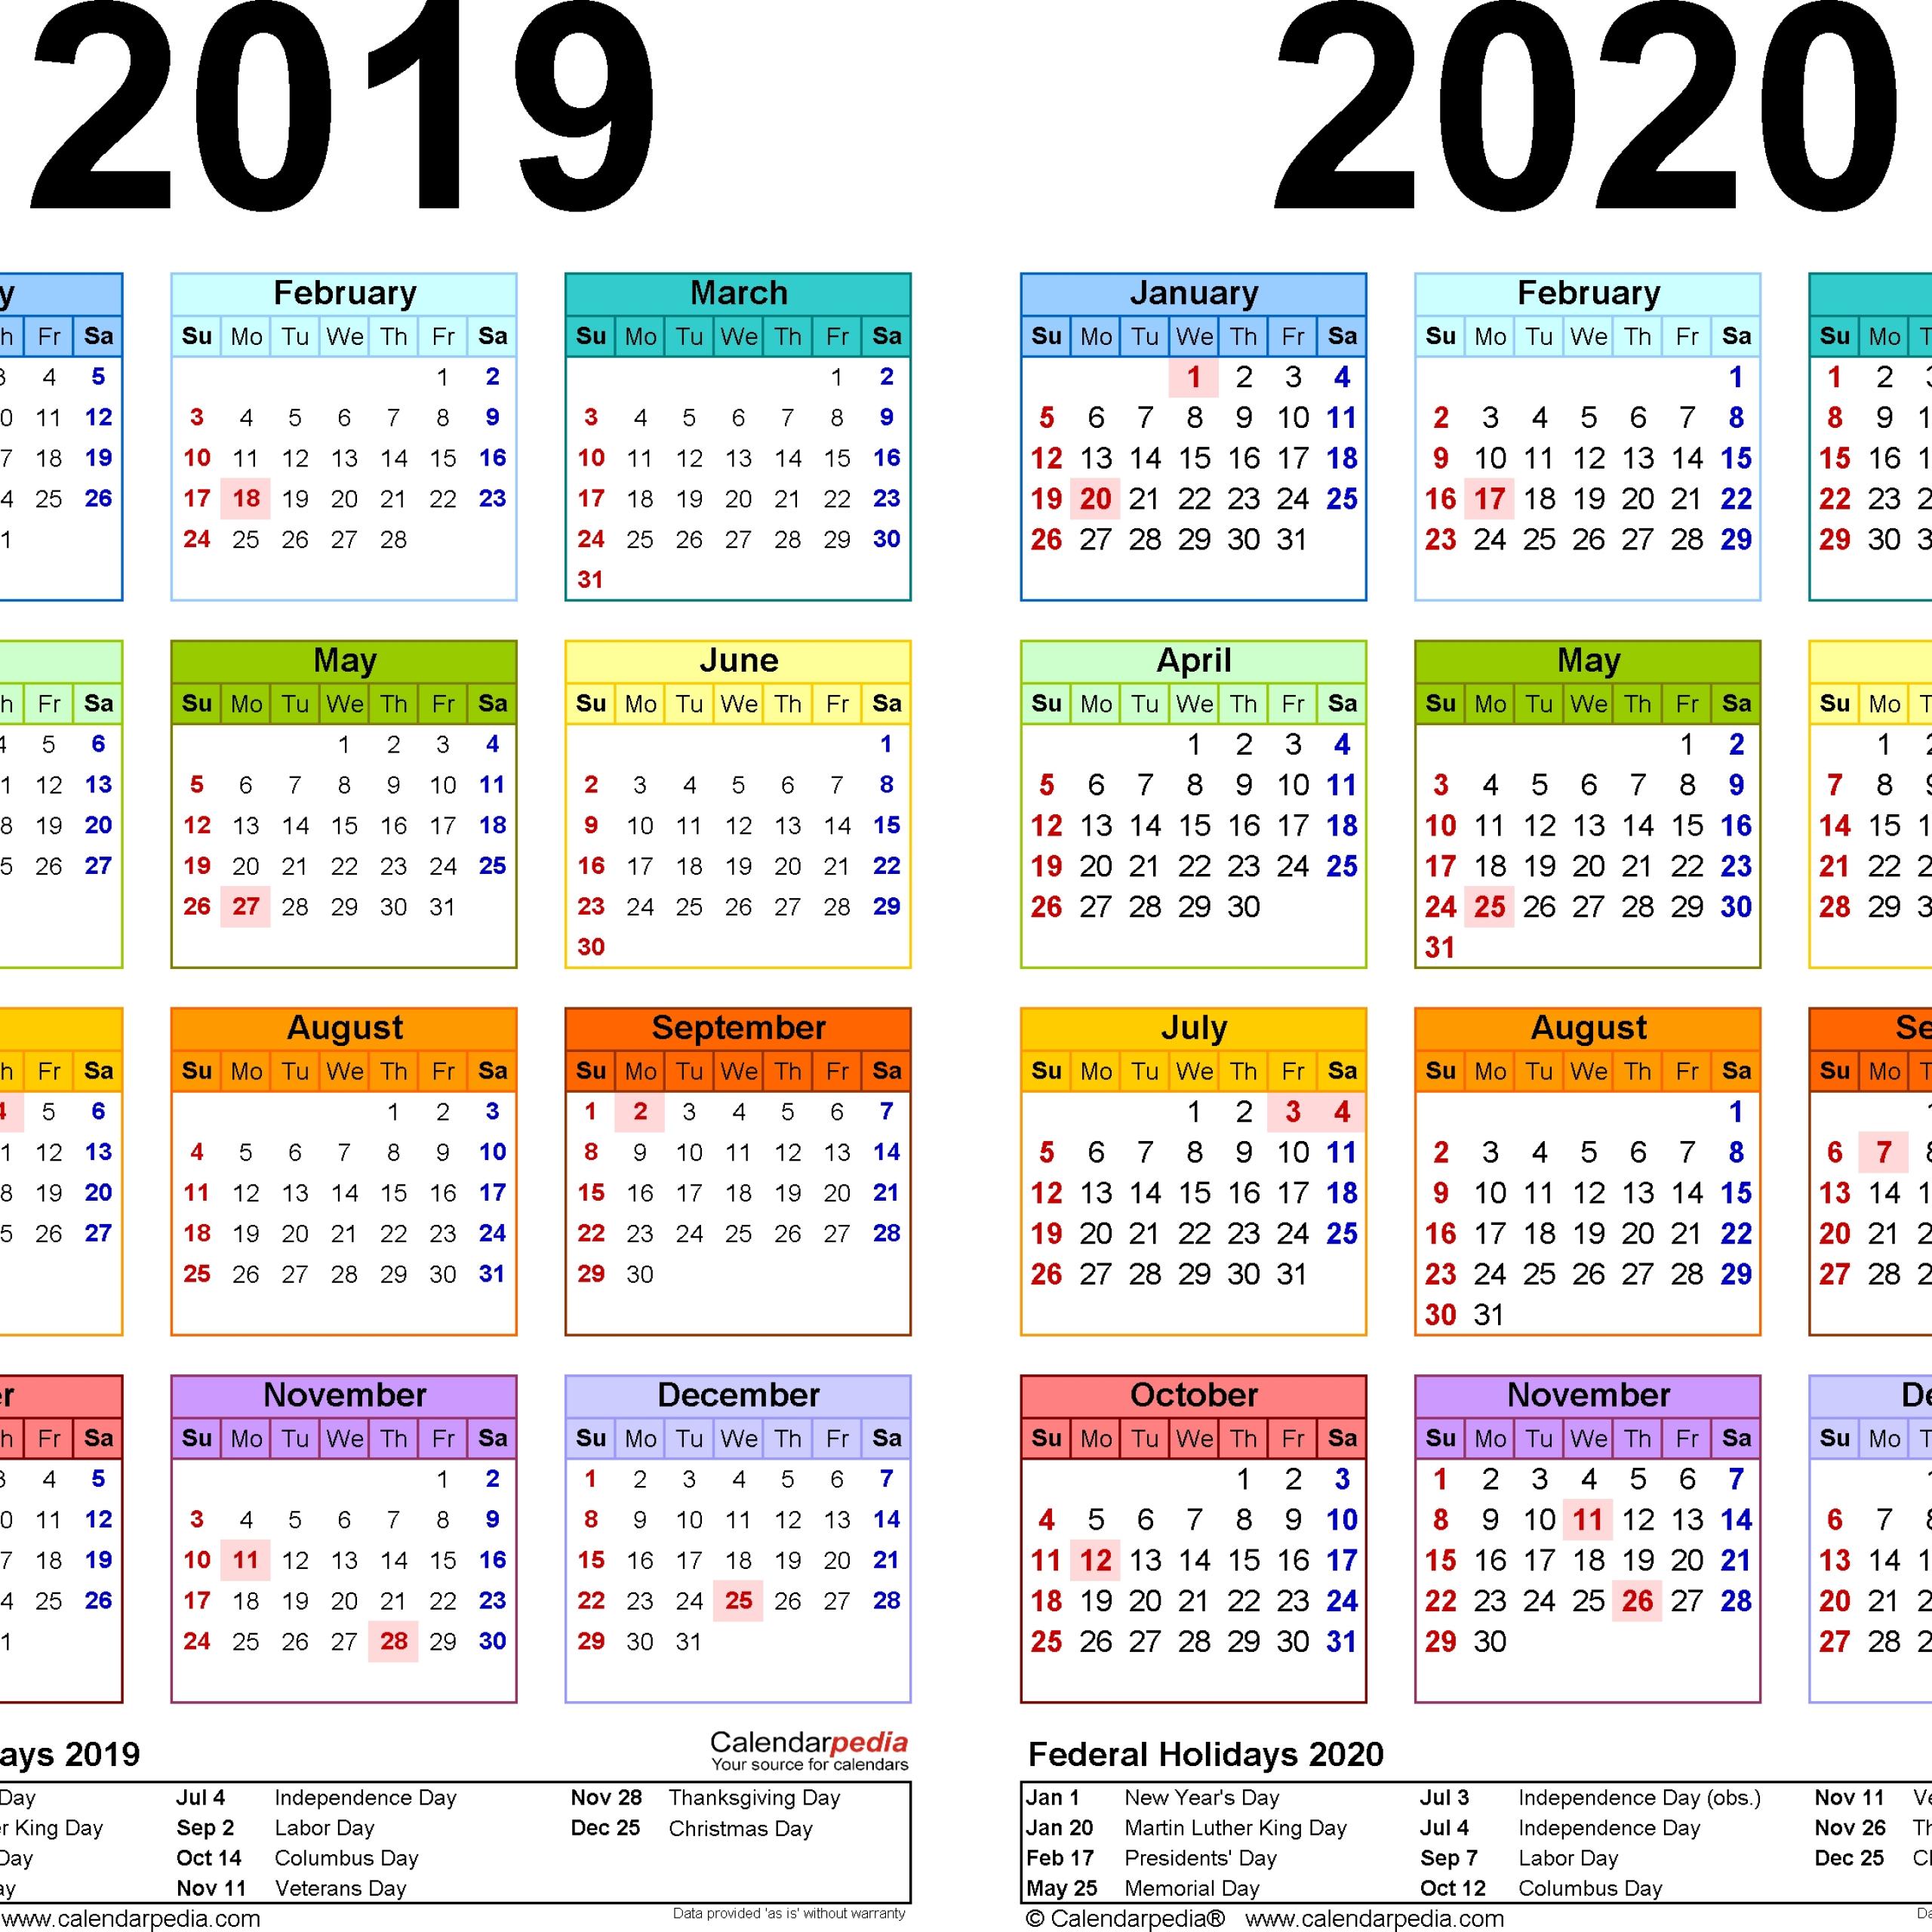 School Calendar 2021 Uae Calendar School Schoolcalendarfree Uae In 2020 School Calendar Bible Reading Schedule One Year Bible